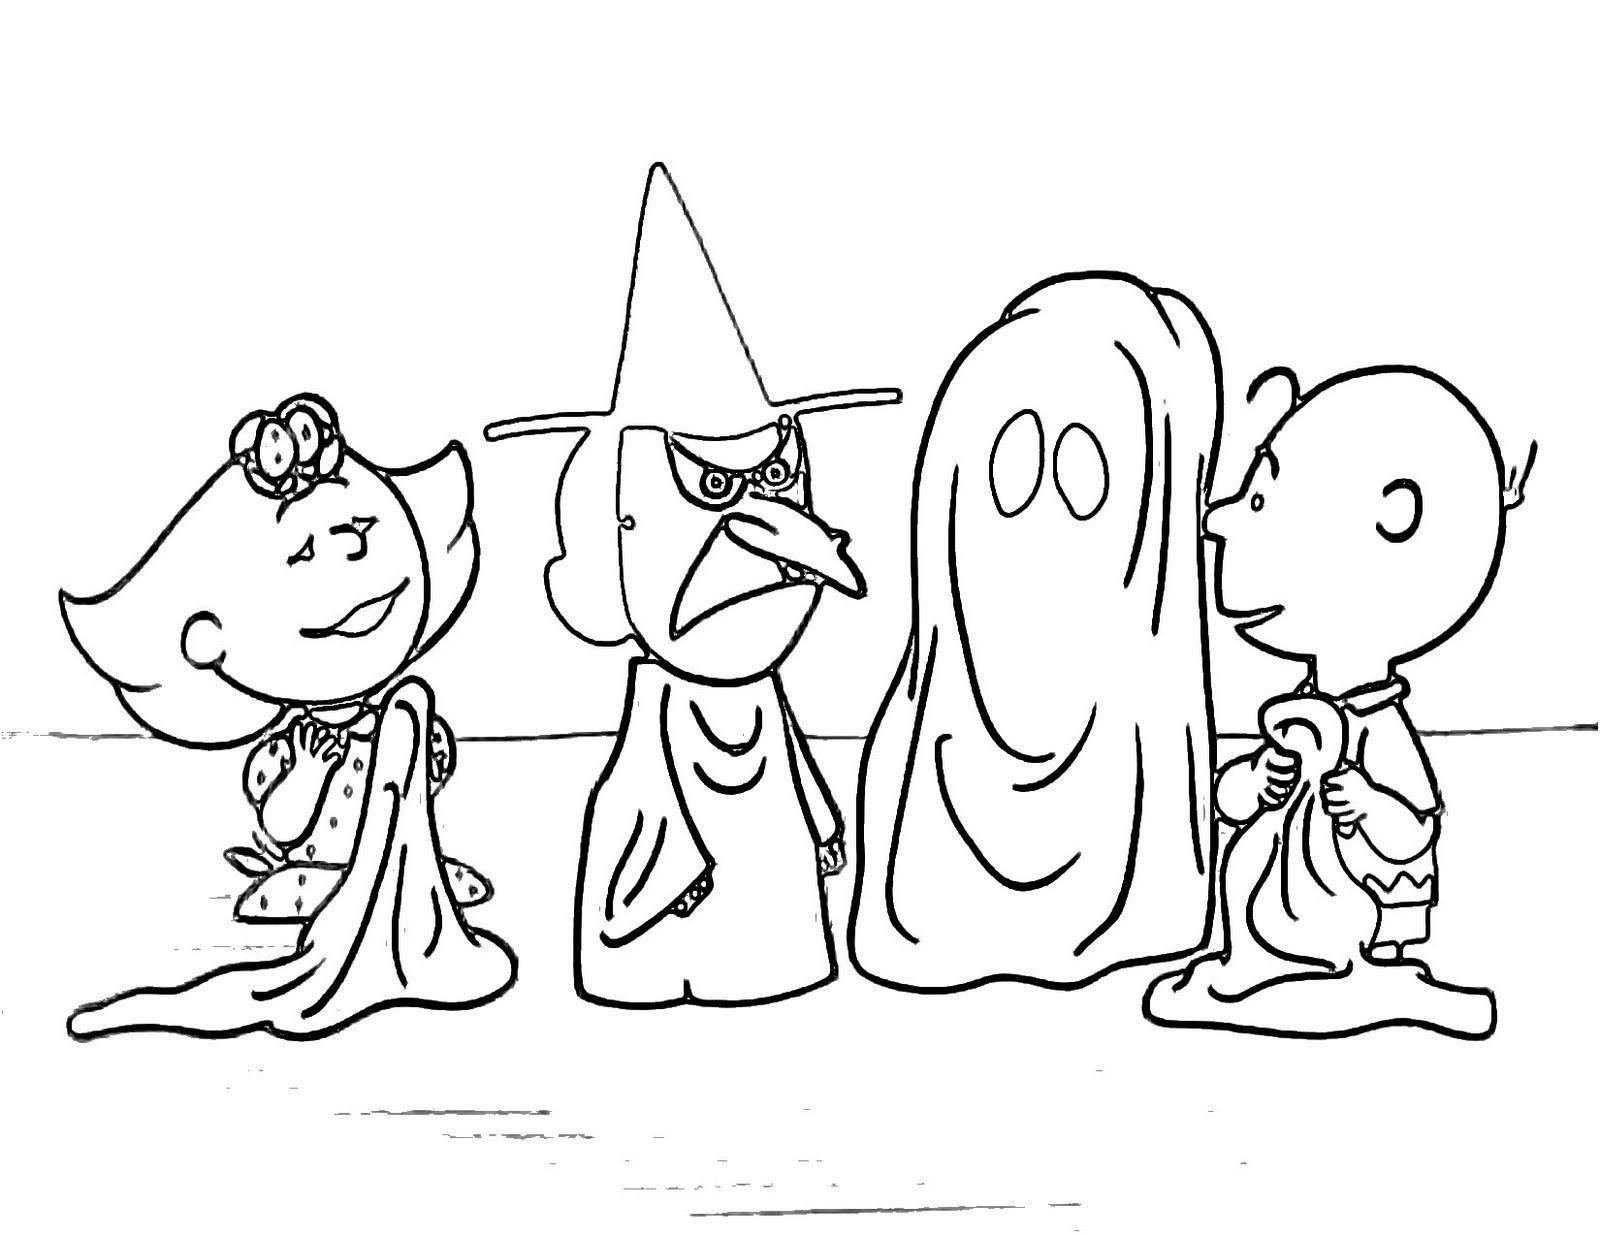 Charlie Brown Halloween Party Halloween Coloring Pages Halloween Coloring Charlie Brown Halloween